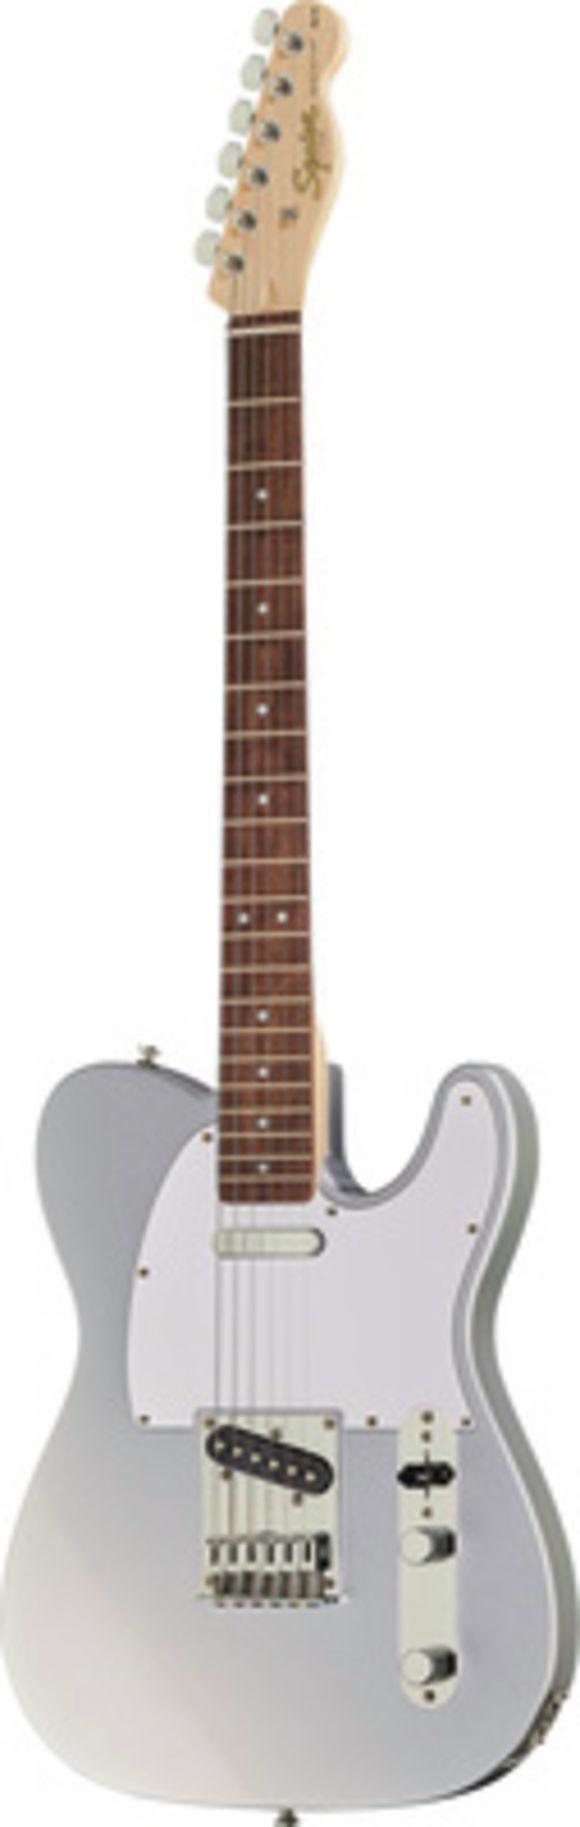 Squier Affinity Tele SLS IL Fender